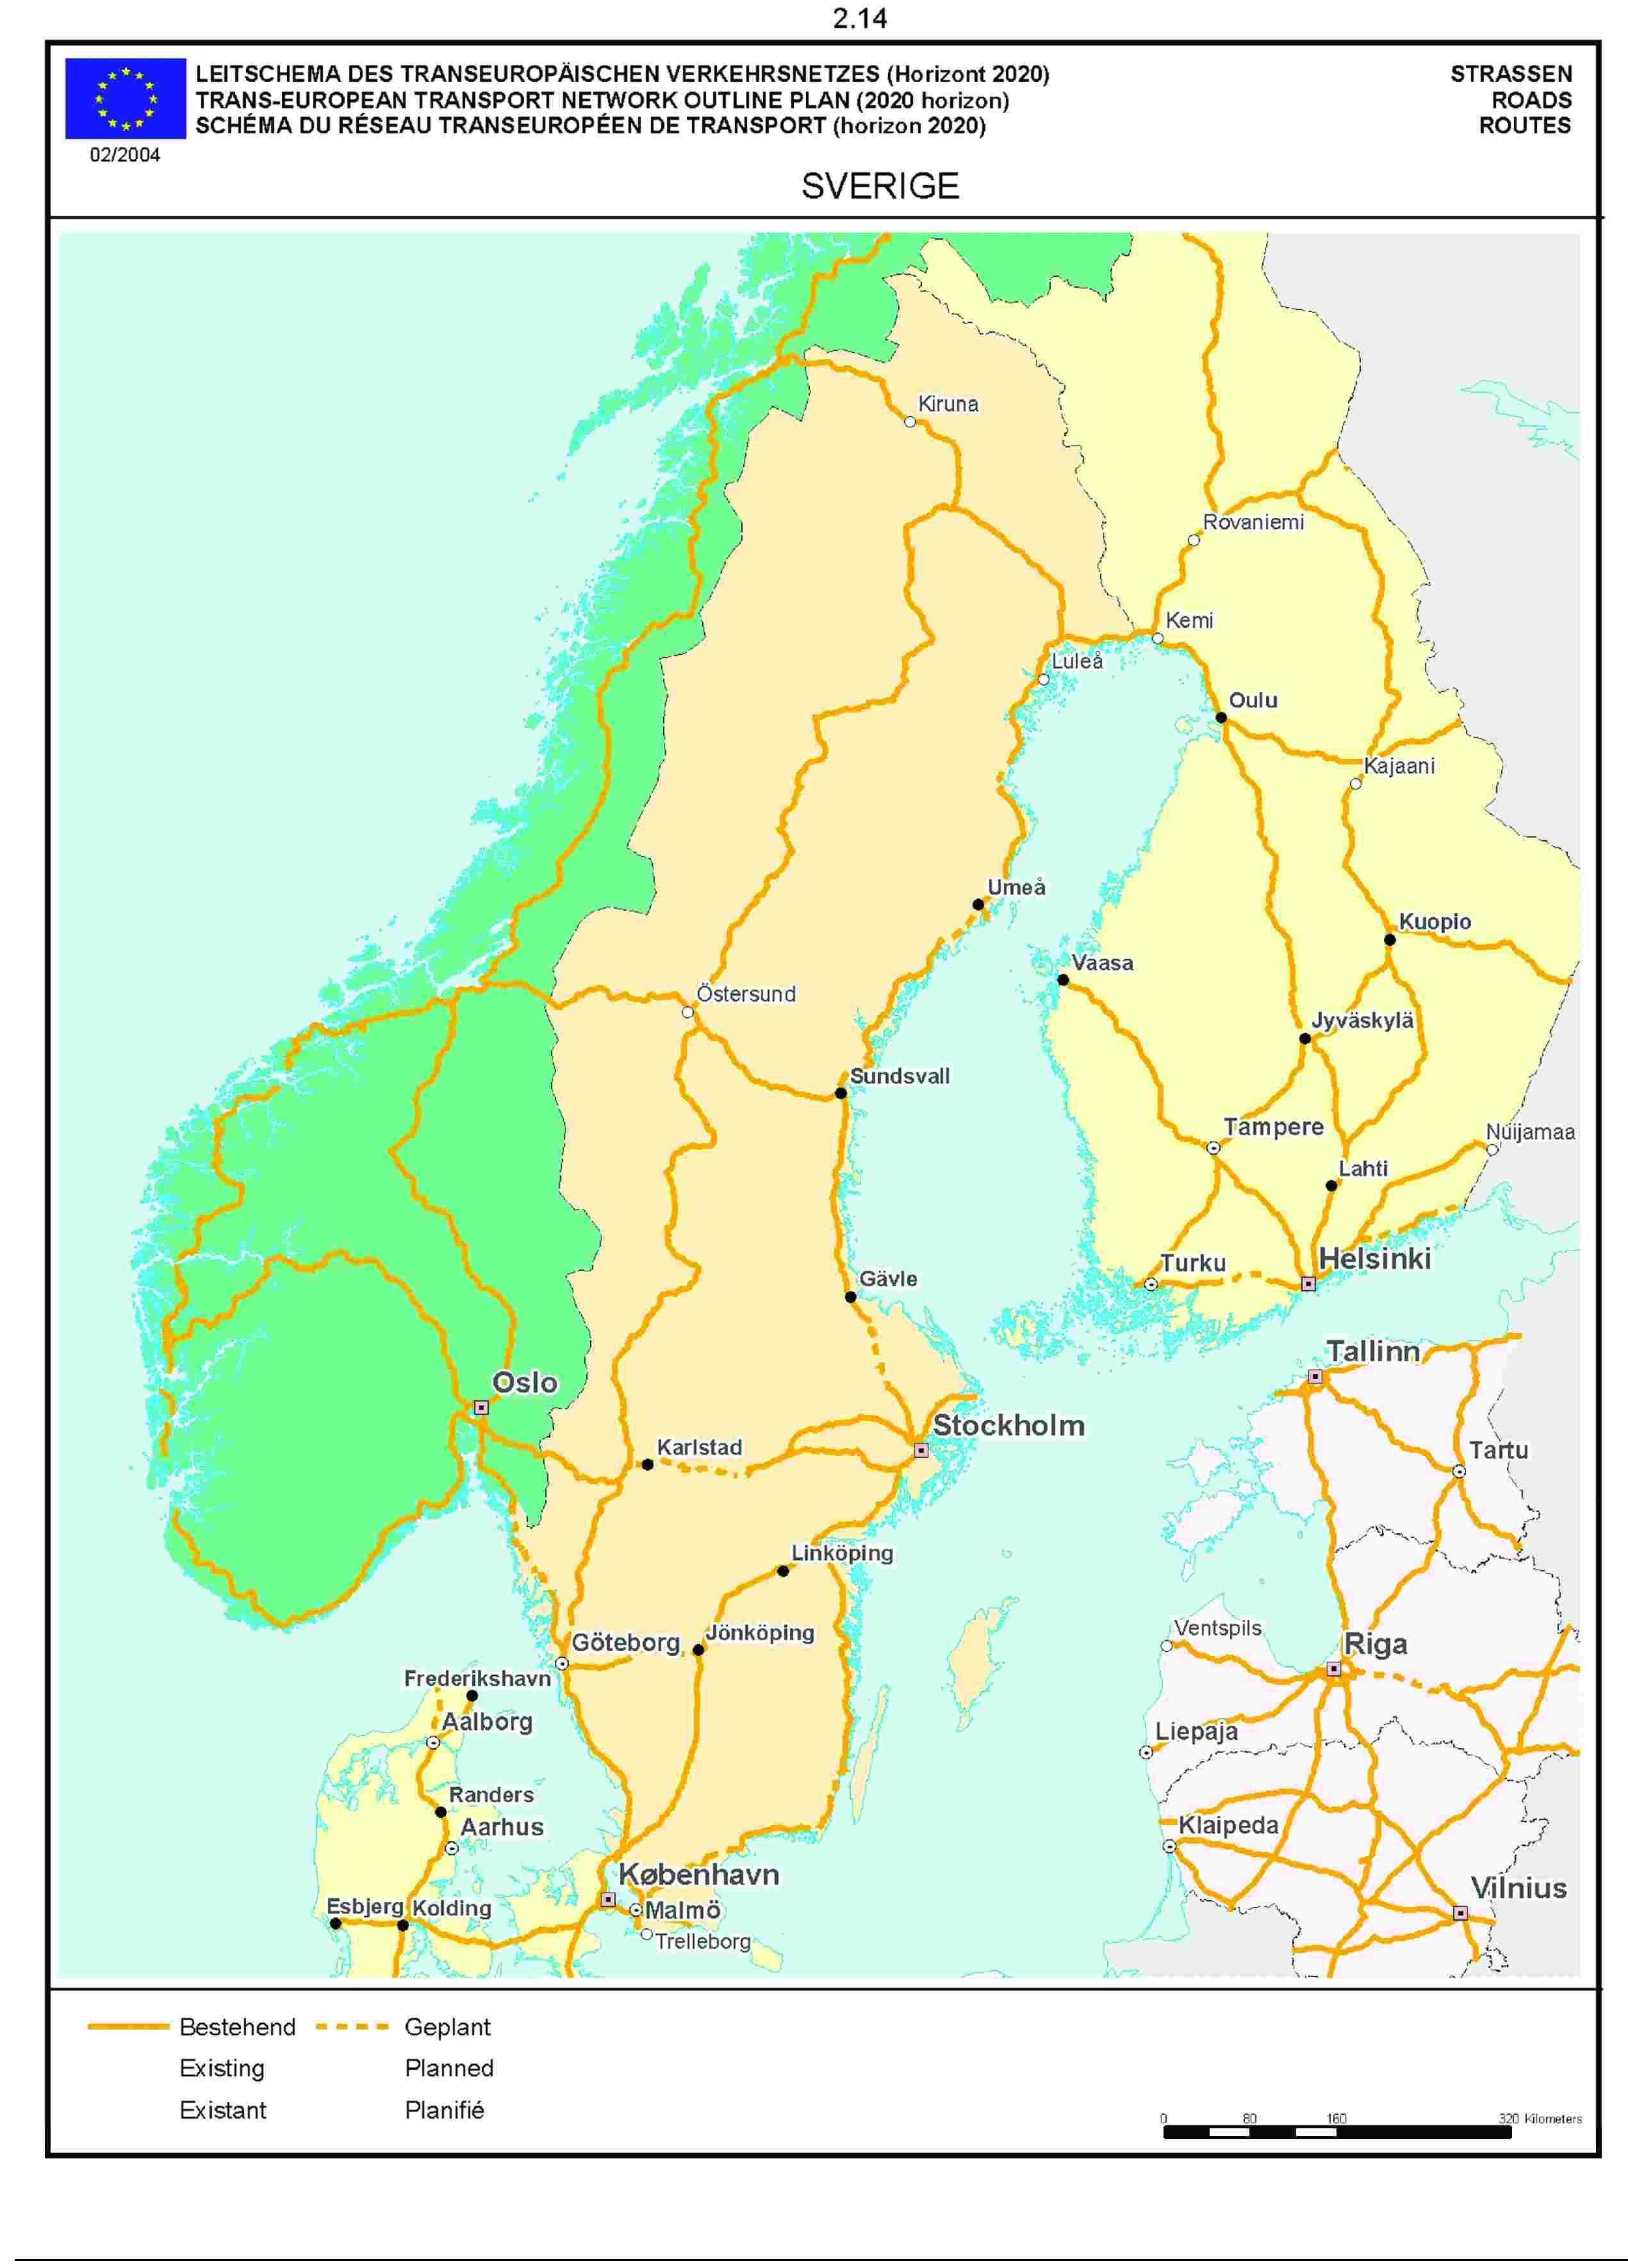 2.14LEITSCHEMA DES TRANSEUROPÄISCHEN VERKEHRSNETZES (Horizont 2020) STRASSENTRANS-EUROPEAN TRANSPORT NETWORK OUTLINE PLAN (2020 horizon) ROADSSCHÉMA DU RÉSEAU TRANSEUROPÉEN DE TRANSPORT (horizon 2020) ROUTE02/2004SVERIGE